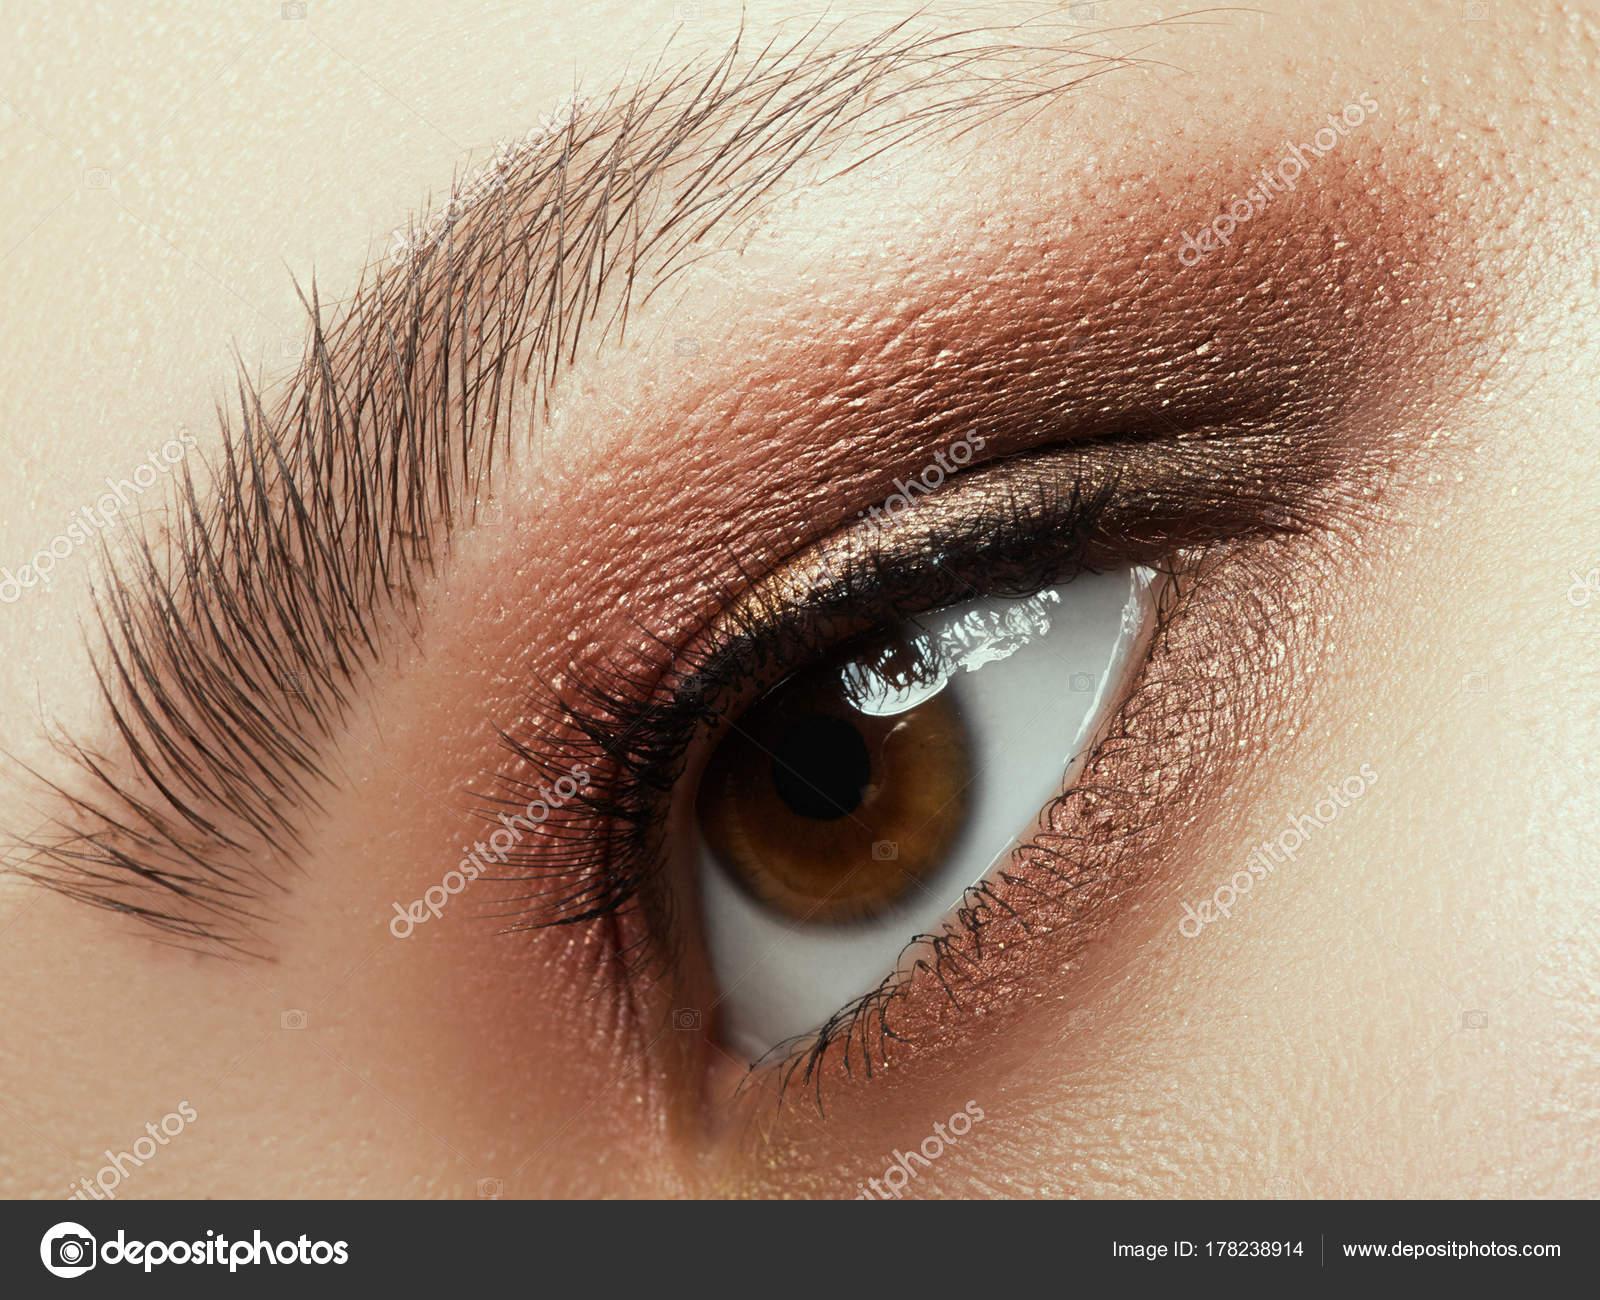 dress - Makeup eye Smokey close up pictures video